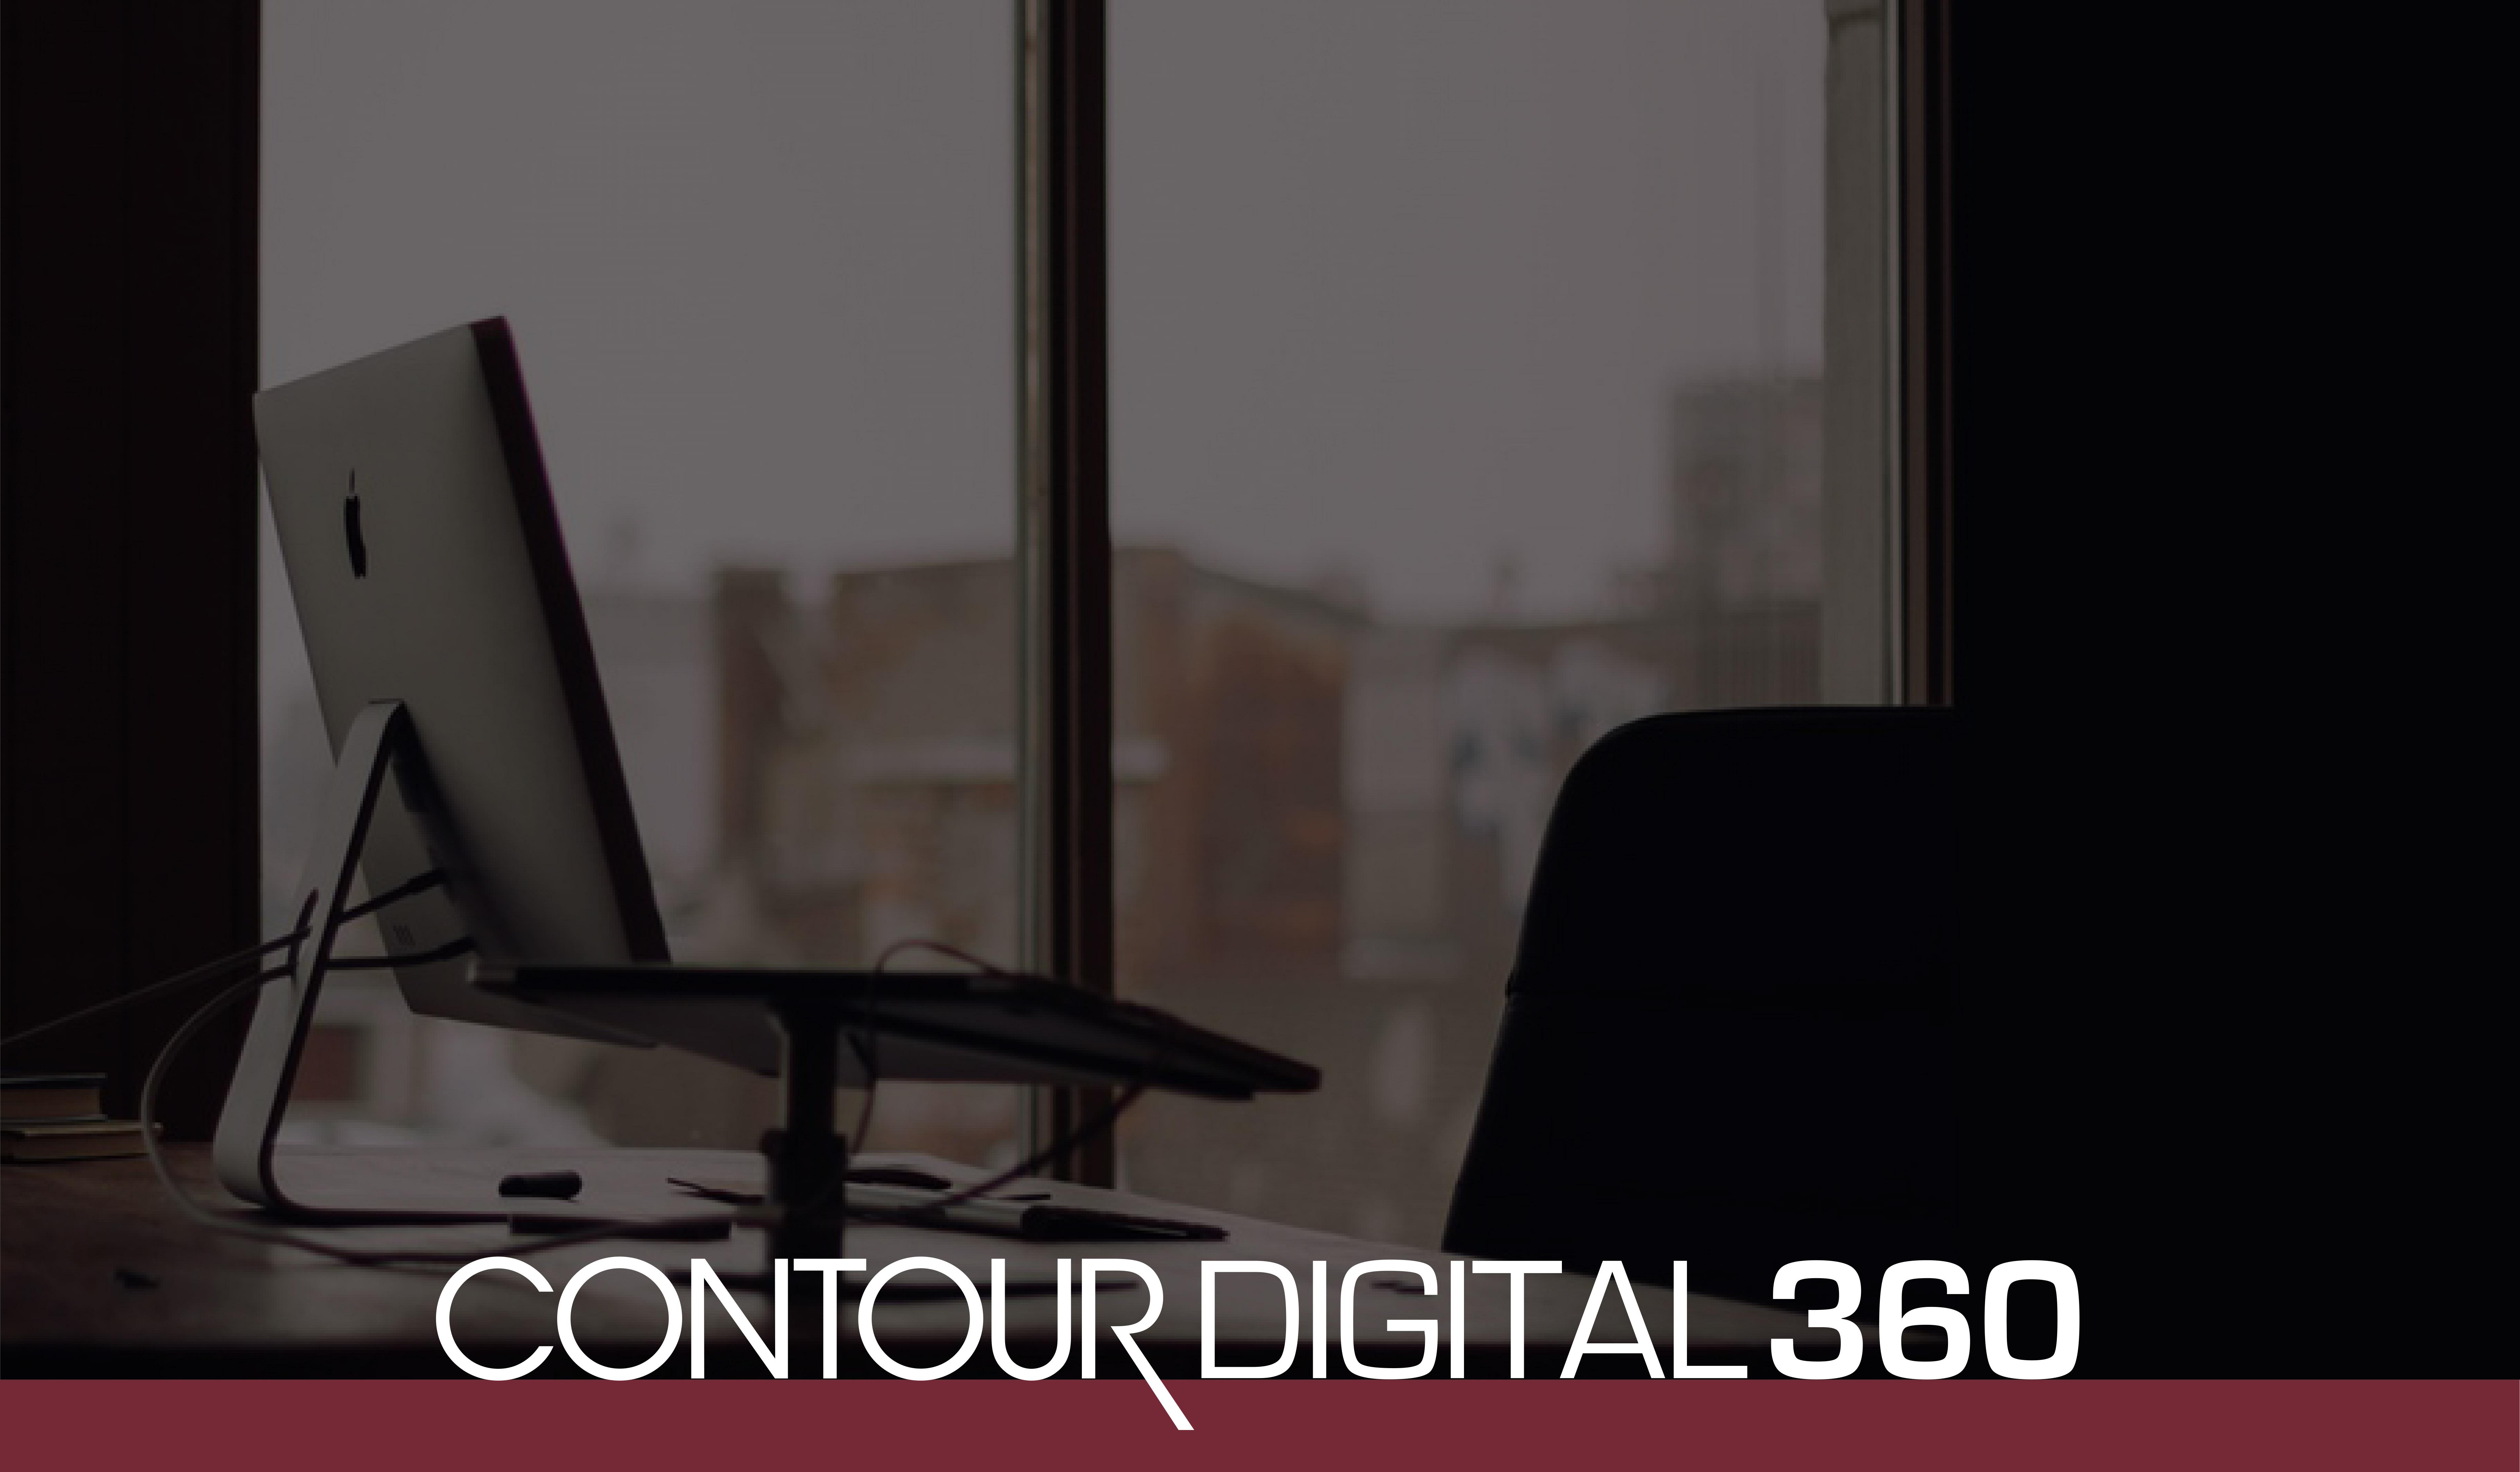 CONTOUR DIGITAL 360